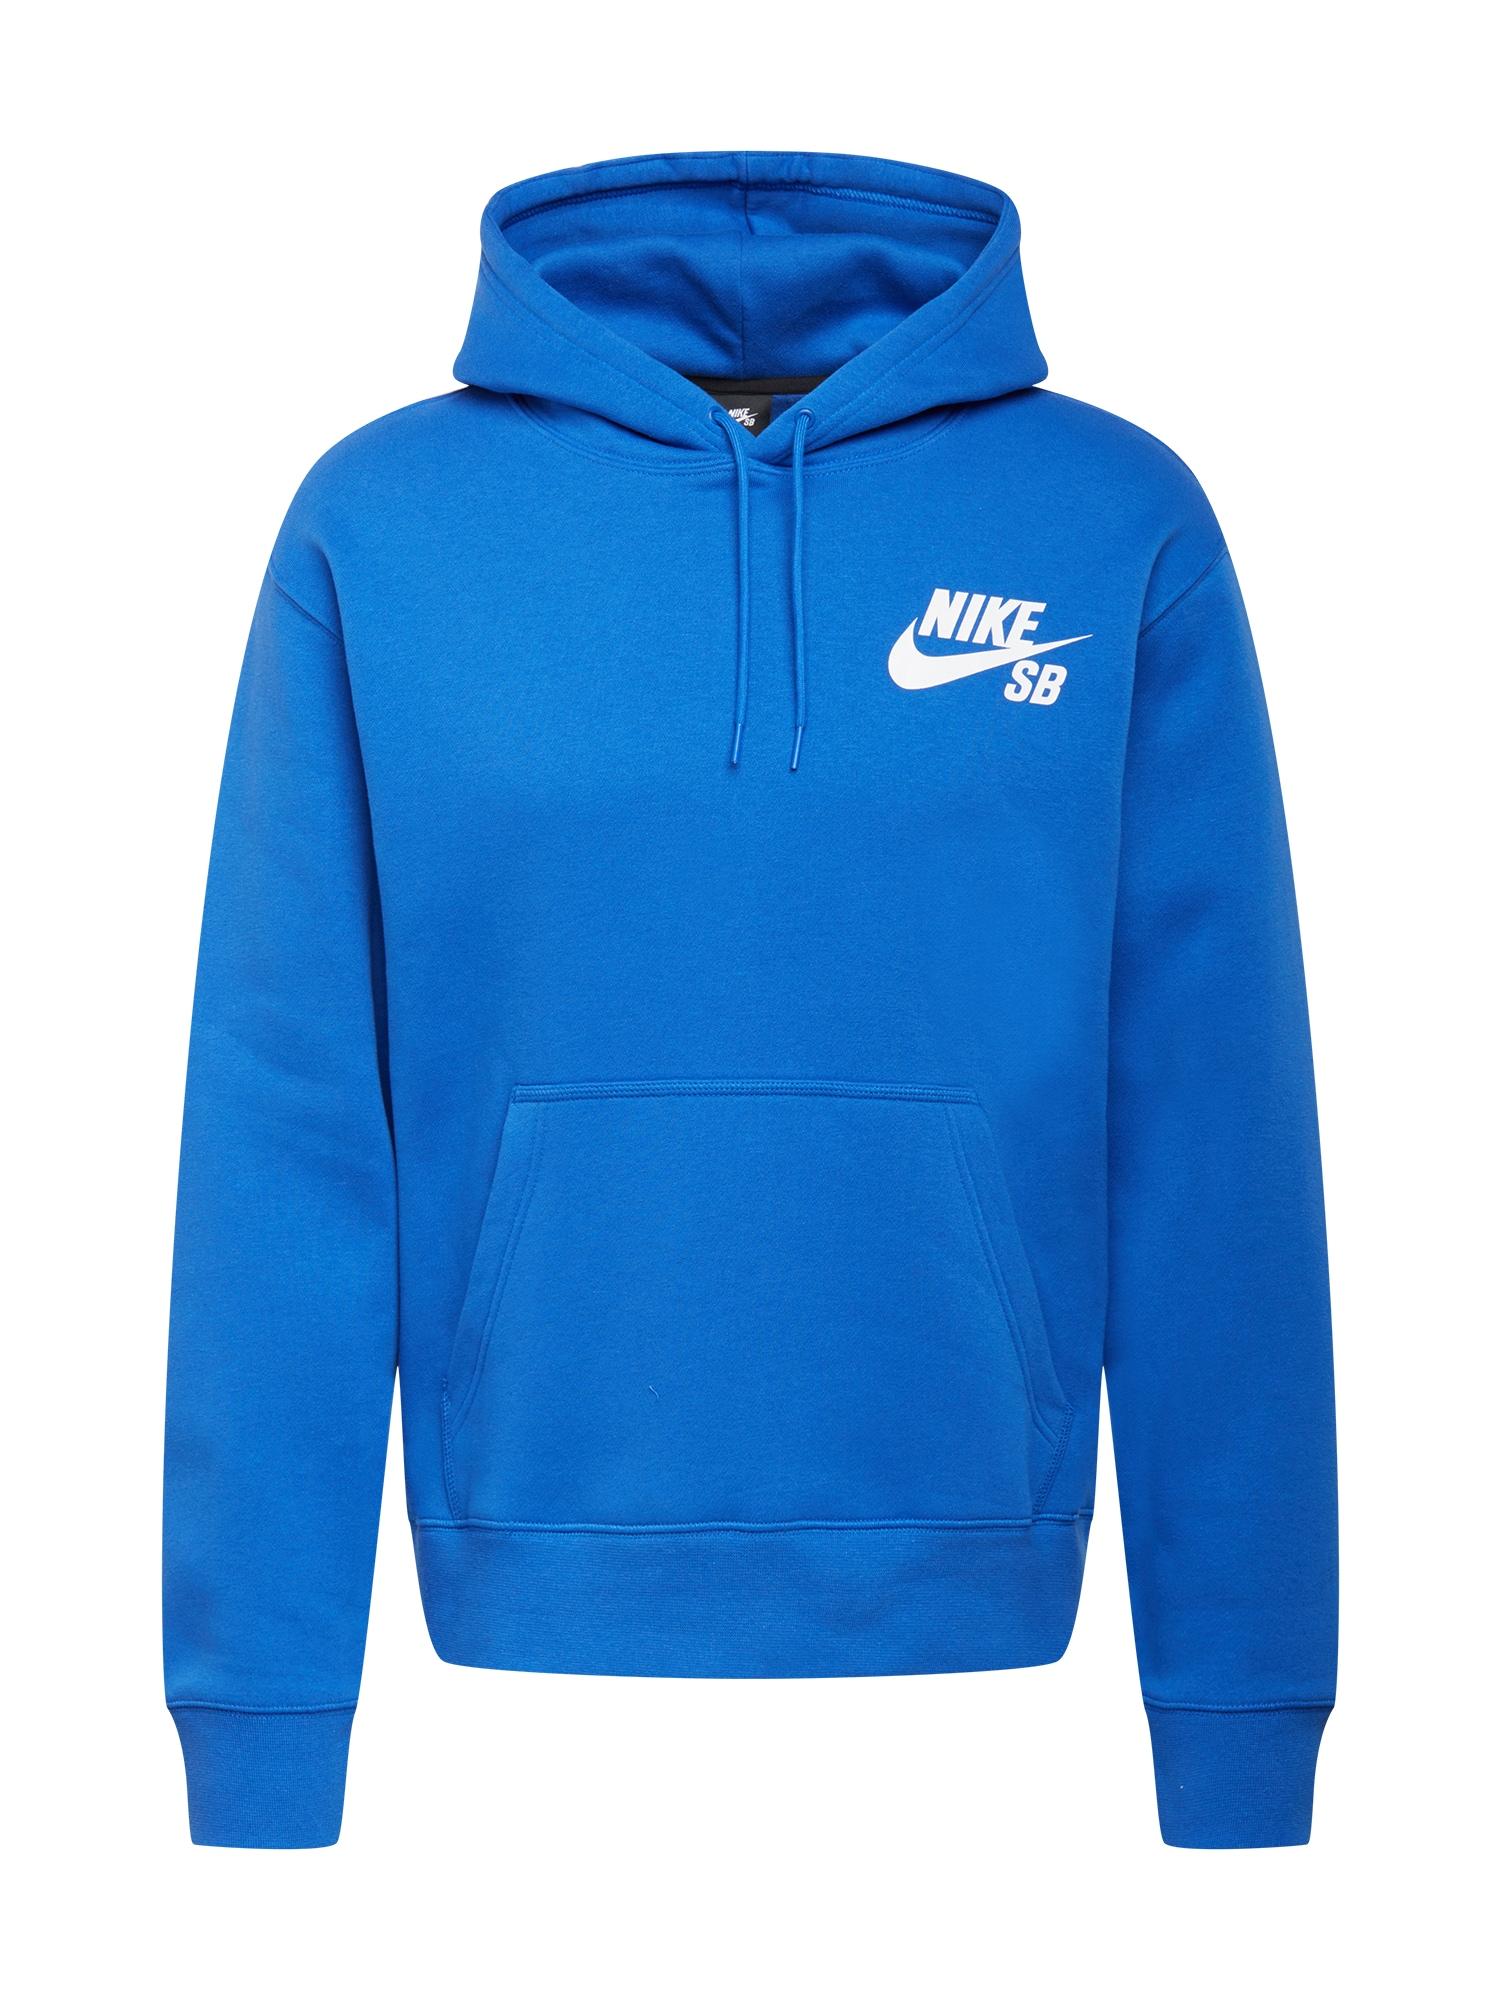 "Nike SB Megztinis be užsegimo sodri mėlyna (""karališka"") / balta"